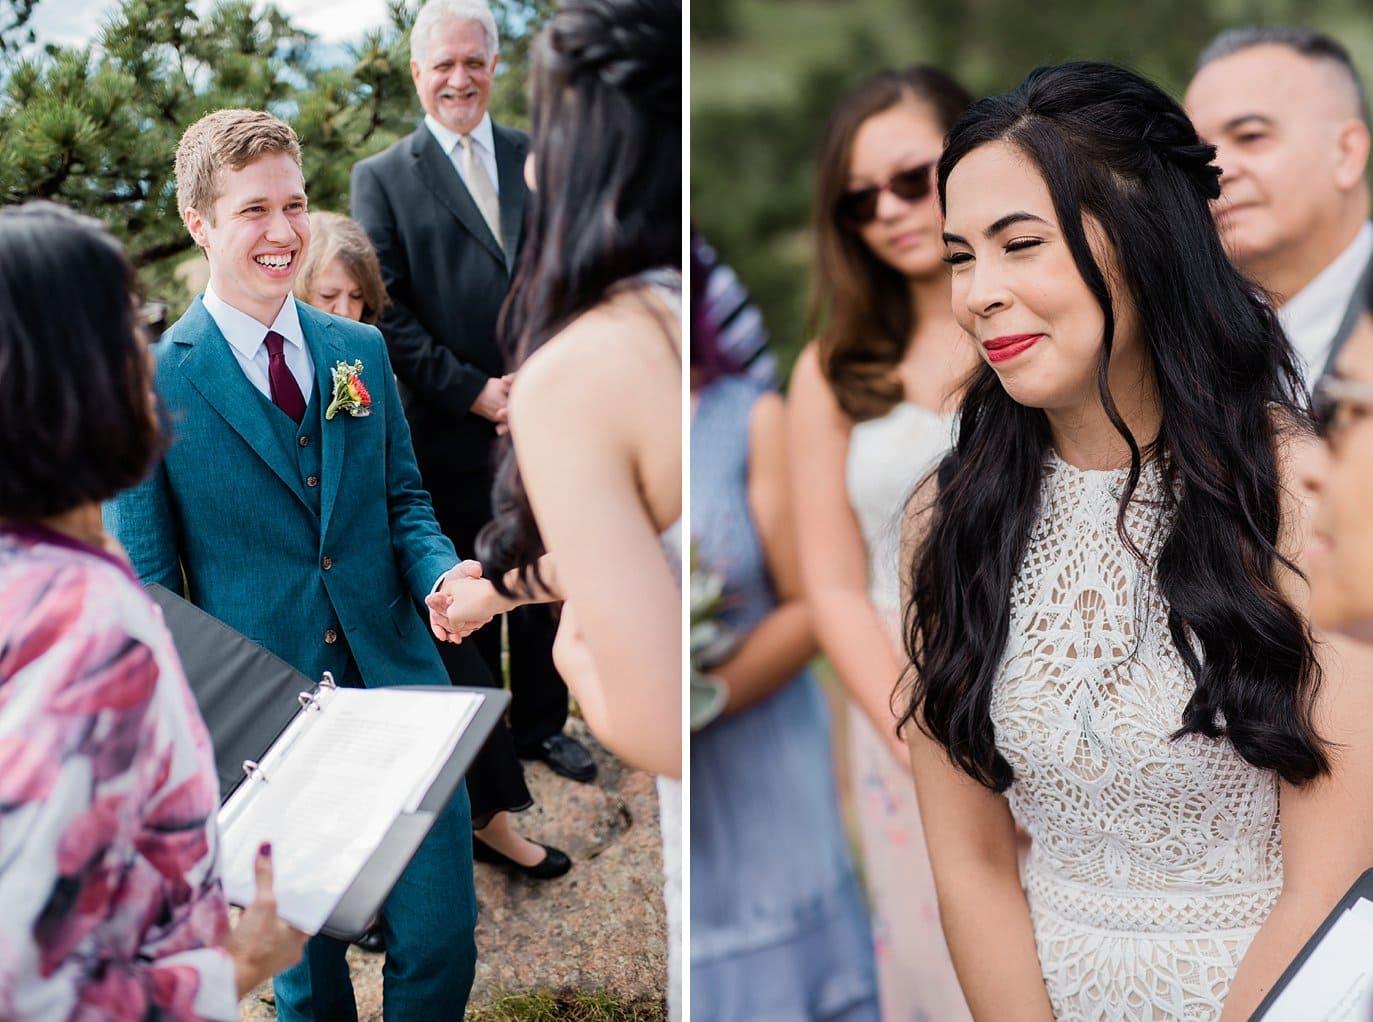 Wedding Ceremony Rocky Mountain National Park 3M Curve wedding by RMNP Wedding Photography Jennie Crate